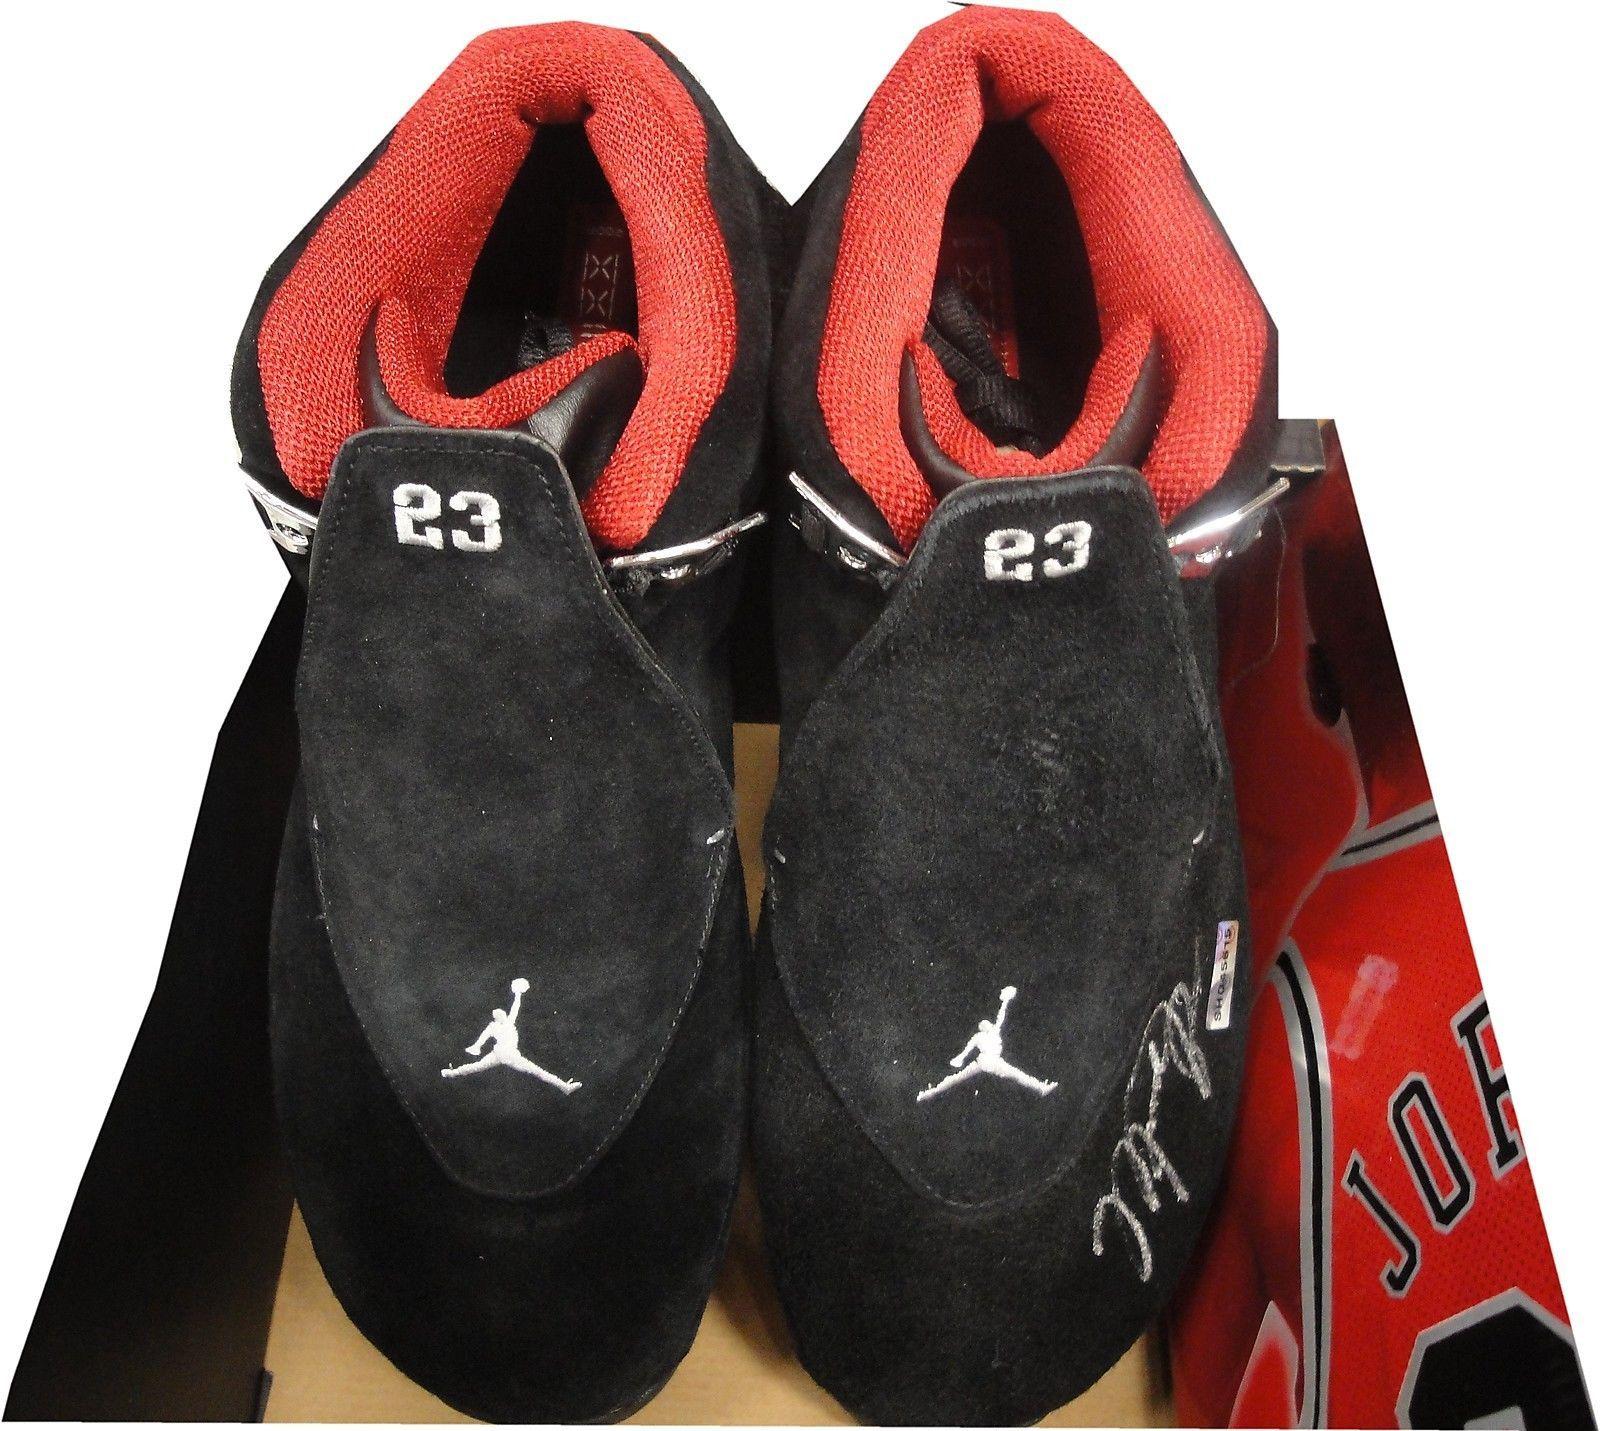 finest selection bce4c f0354 Michael Jordan Hand Signed Autographed Air Jordan Nike Shoe ...